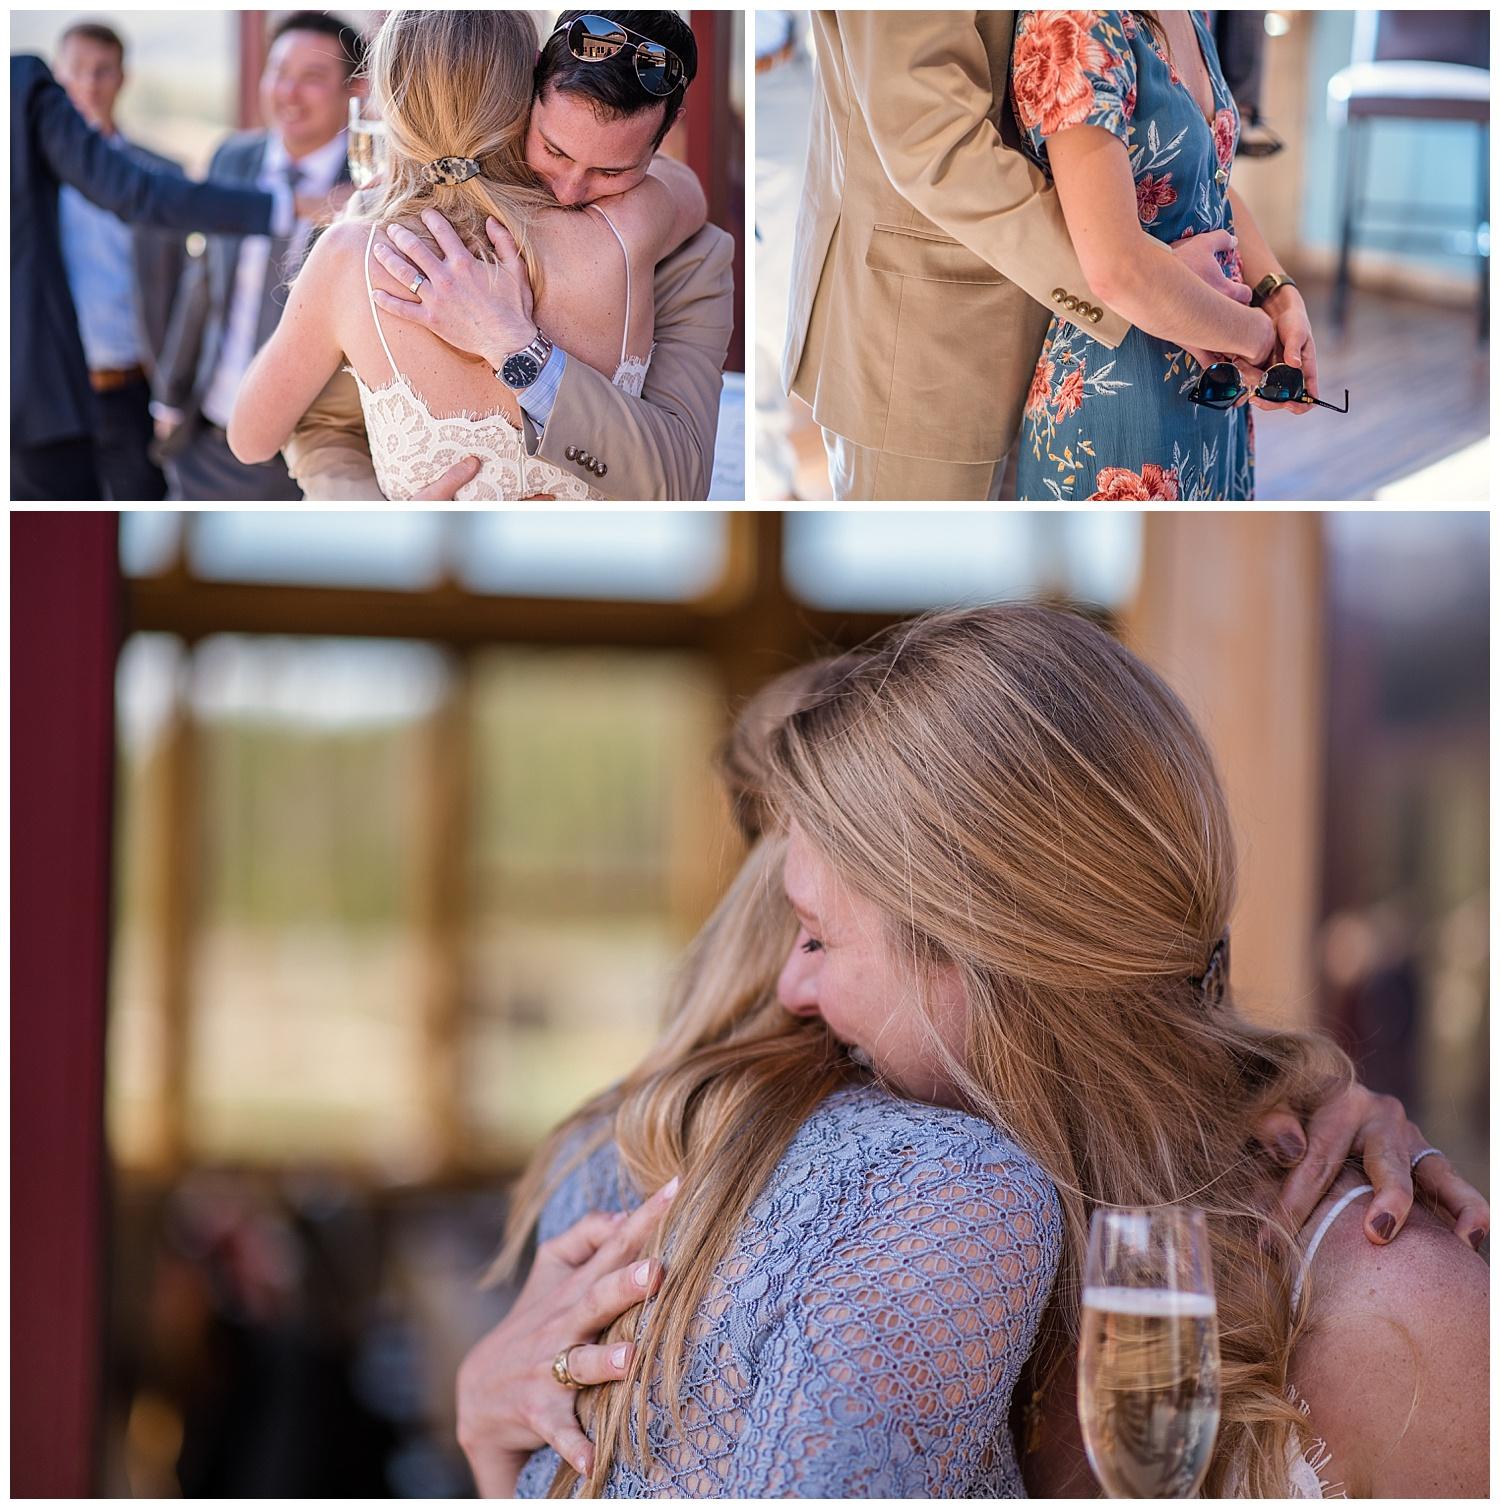 happy wedding guests in rocky mountain national park, colorado wedding photographer, denver wedding photographer, colorado elopement photographer, denver elopement photographer, rocky mountain photographer